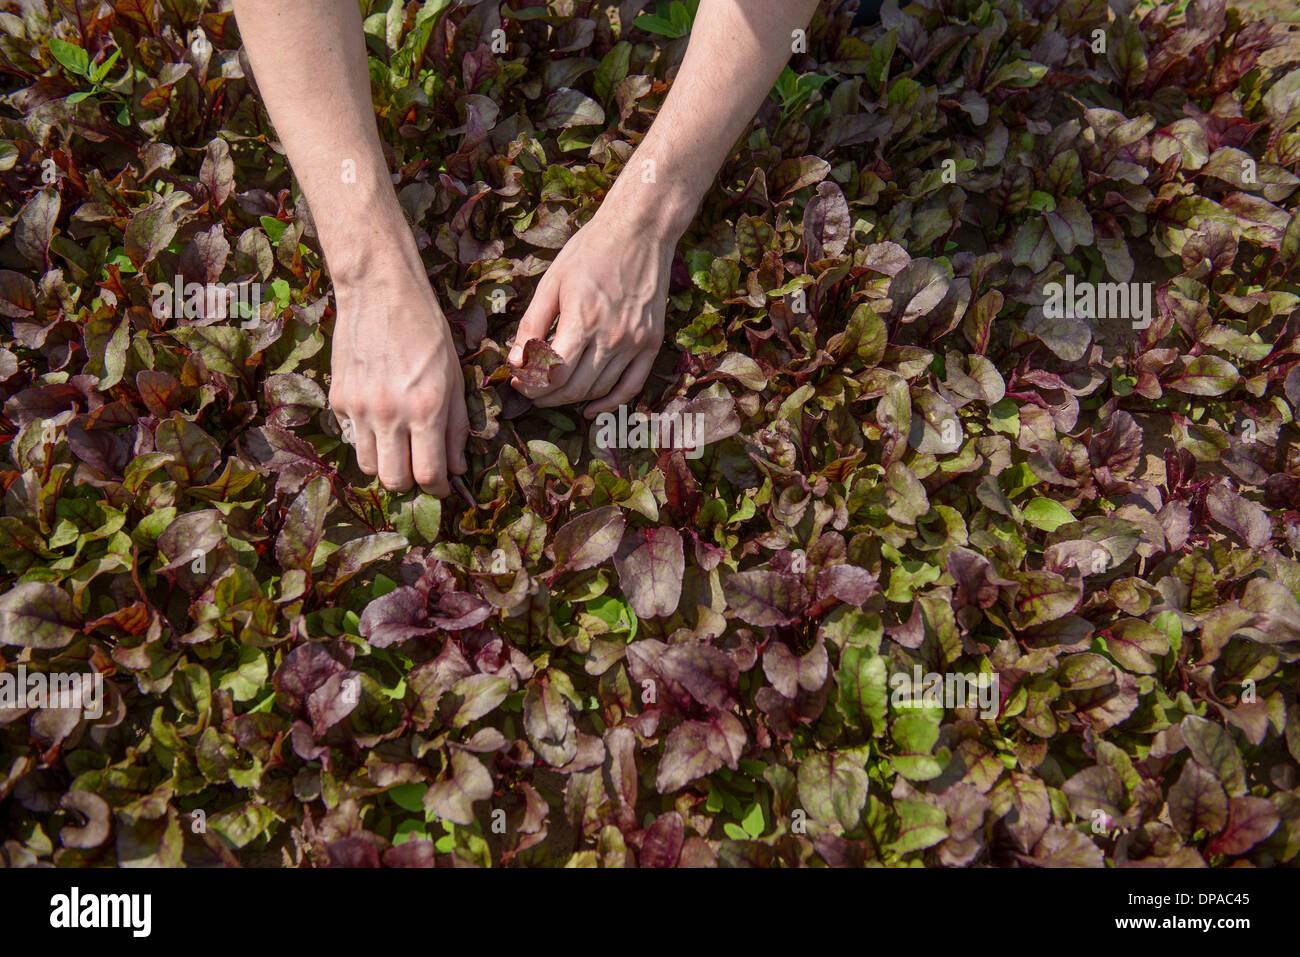 Worker picking salad crop - Stock Image